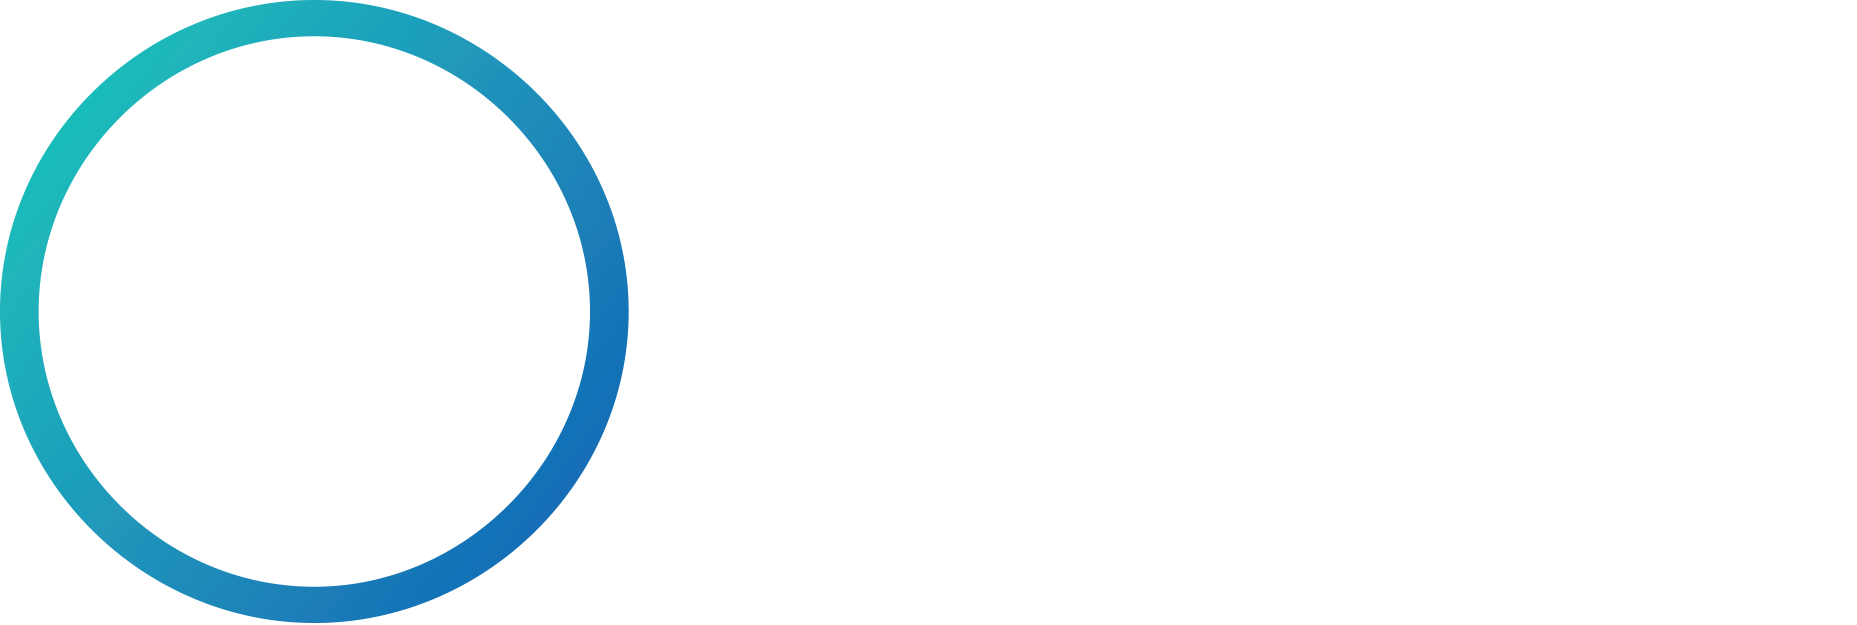 Dentistry's Optimal Model